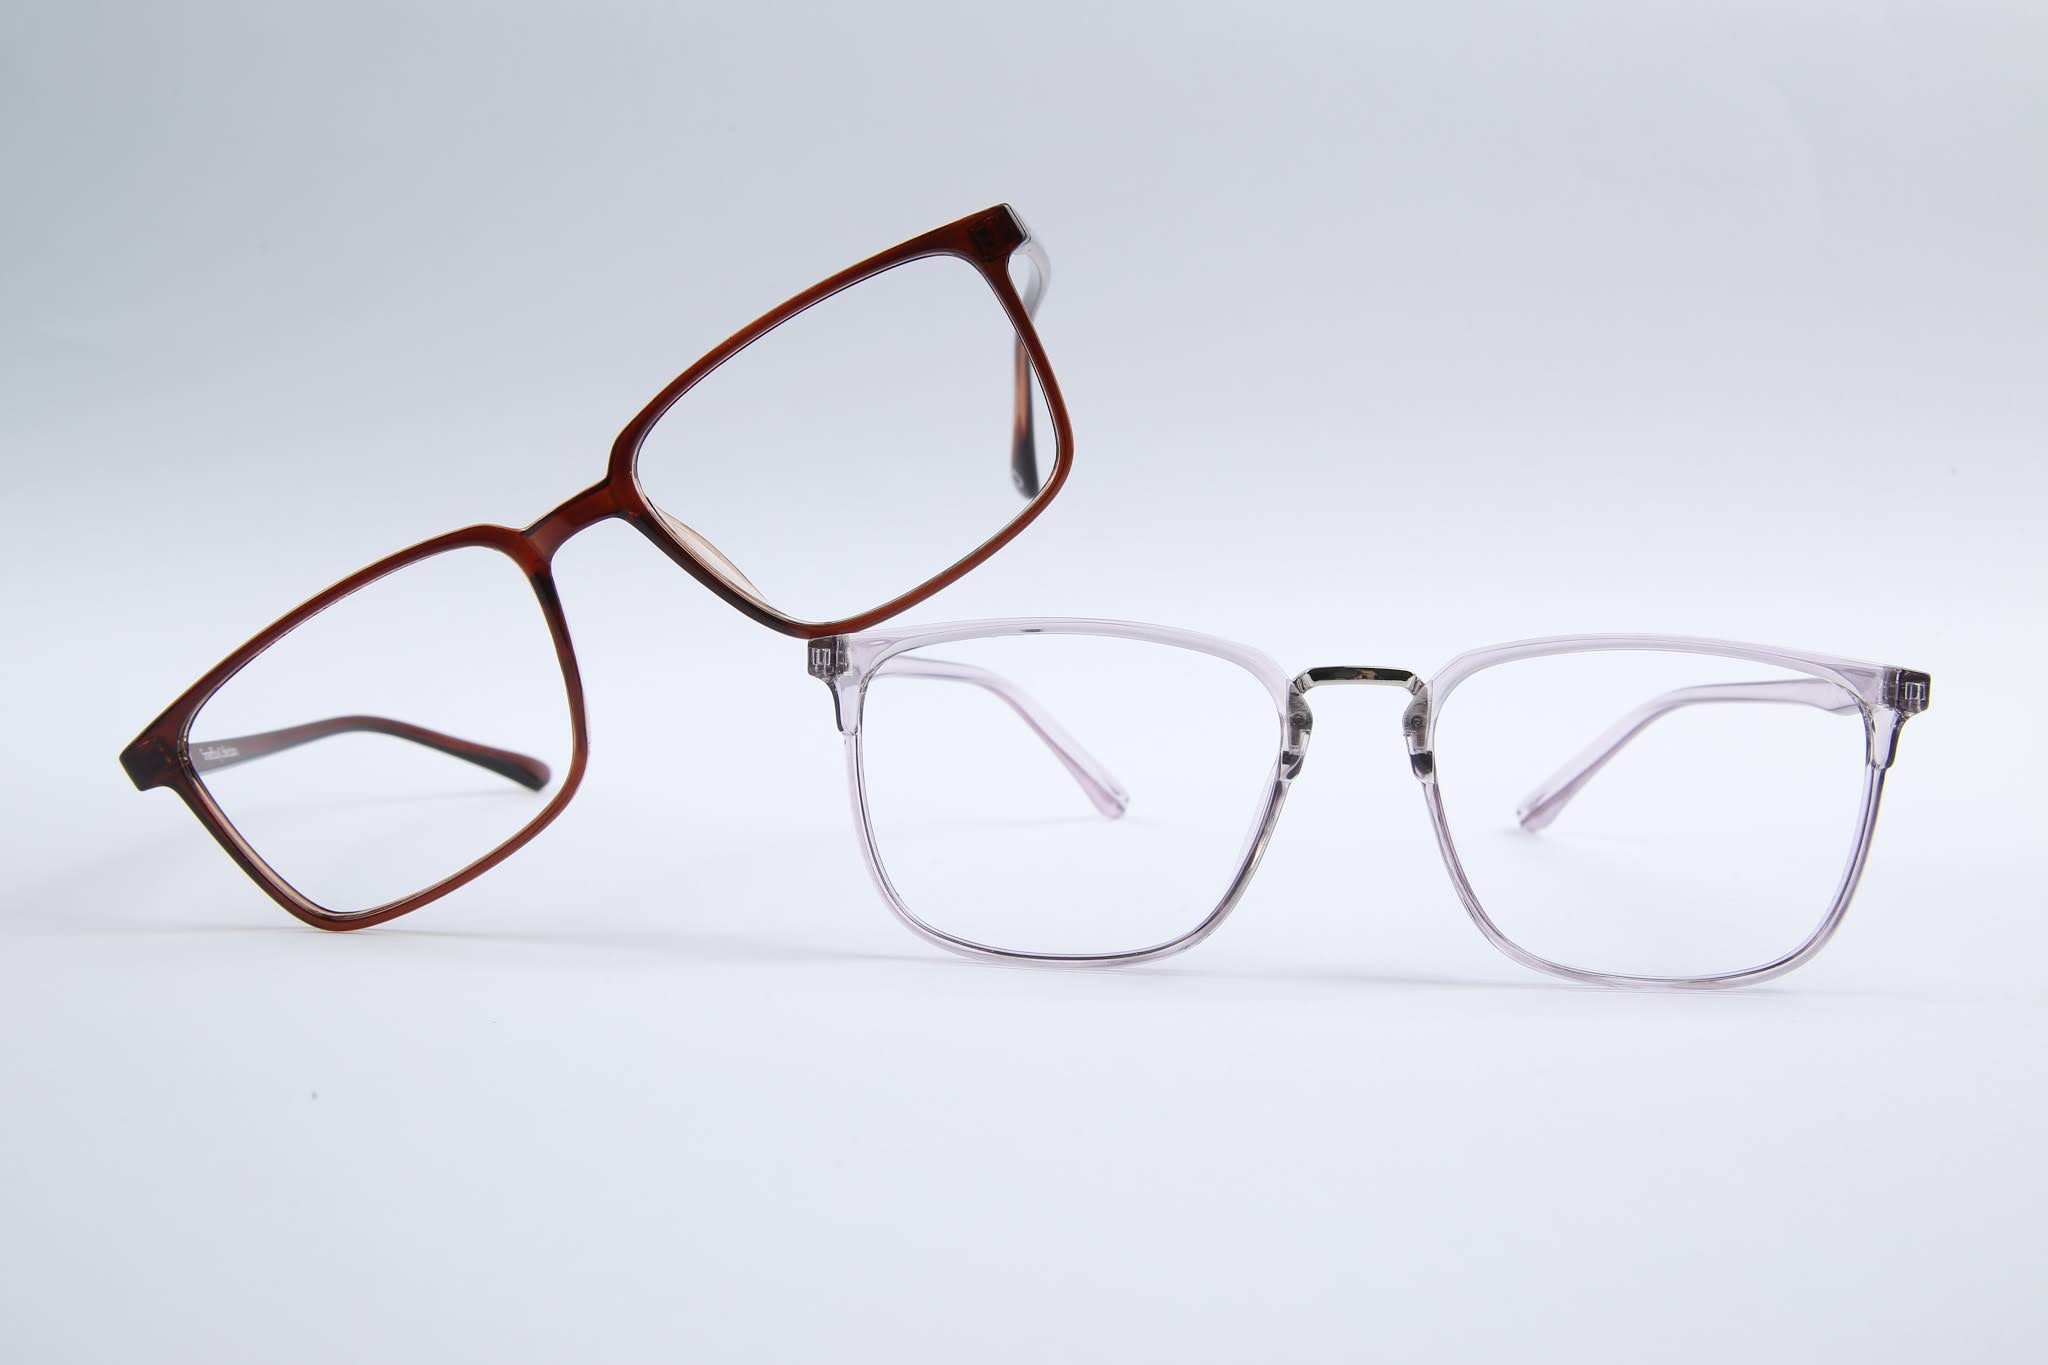 New affordable eyewear line